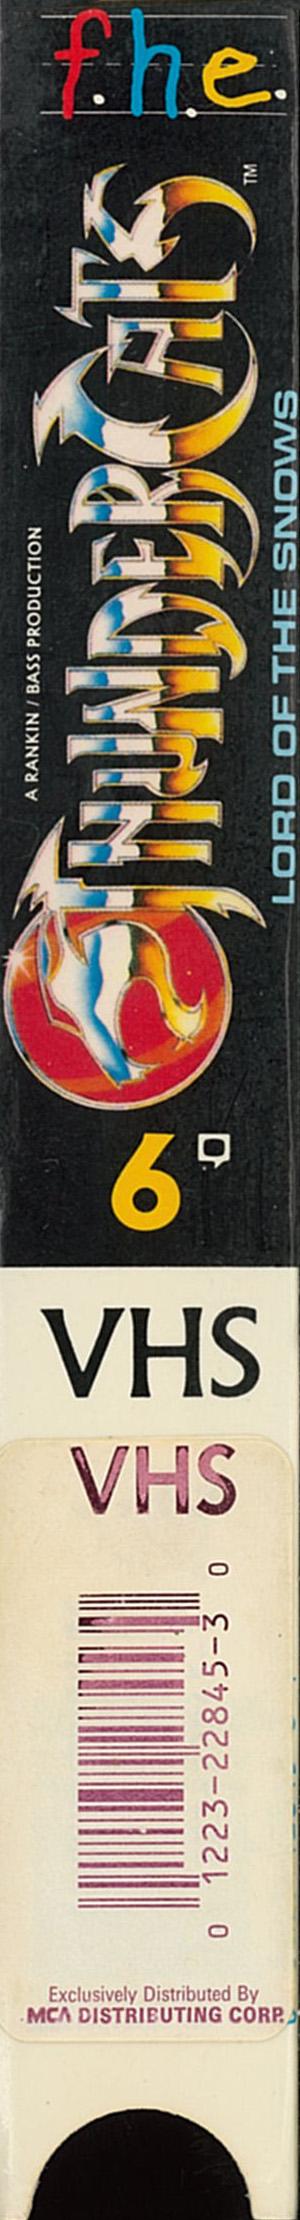 Volume 6 Right Spine